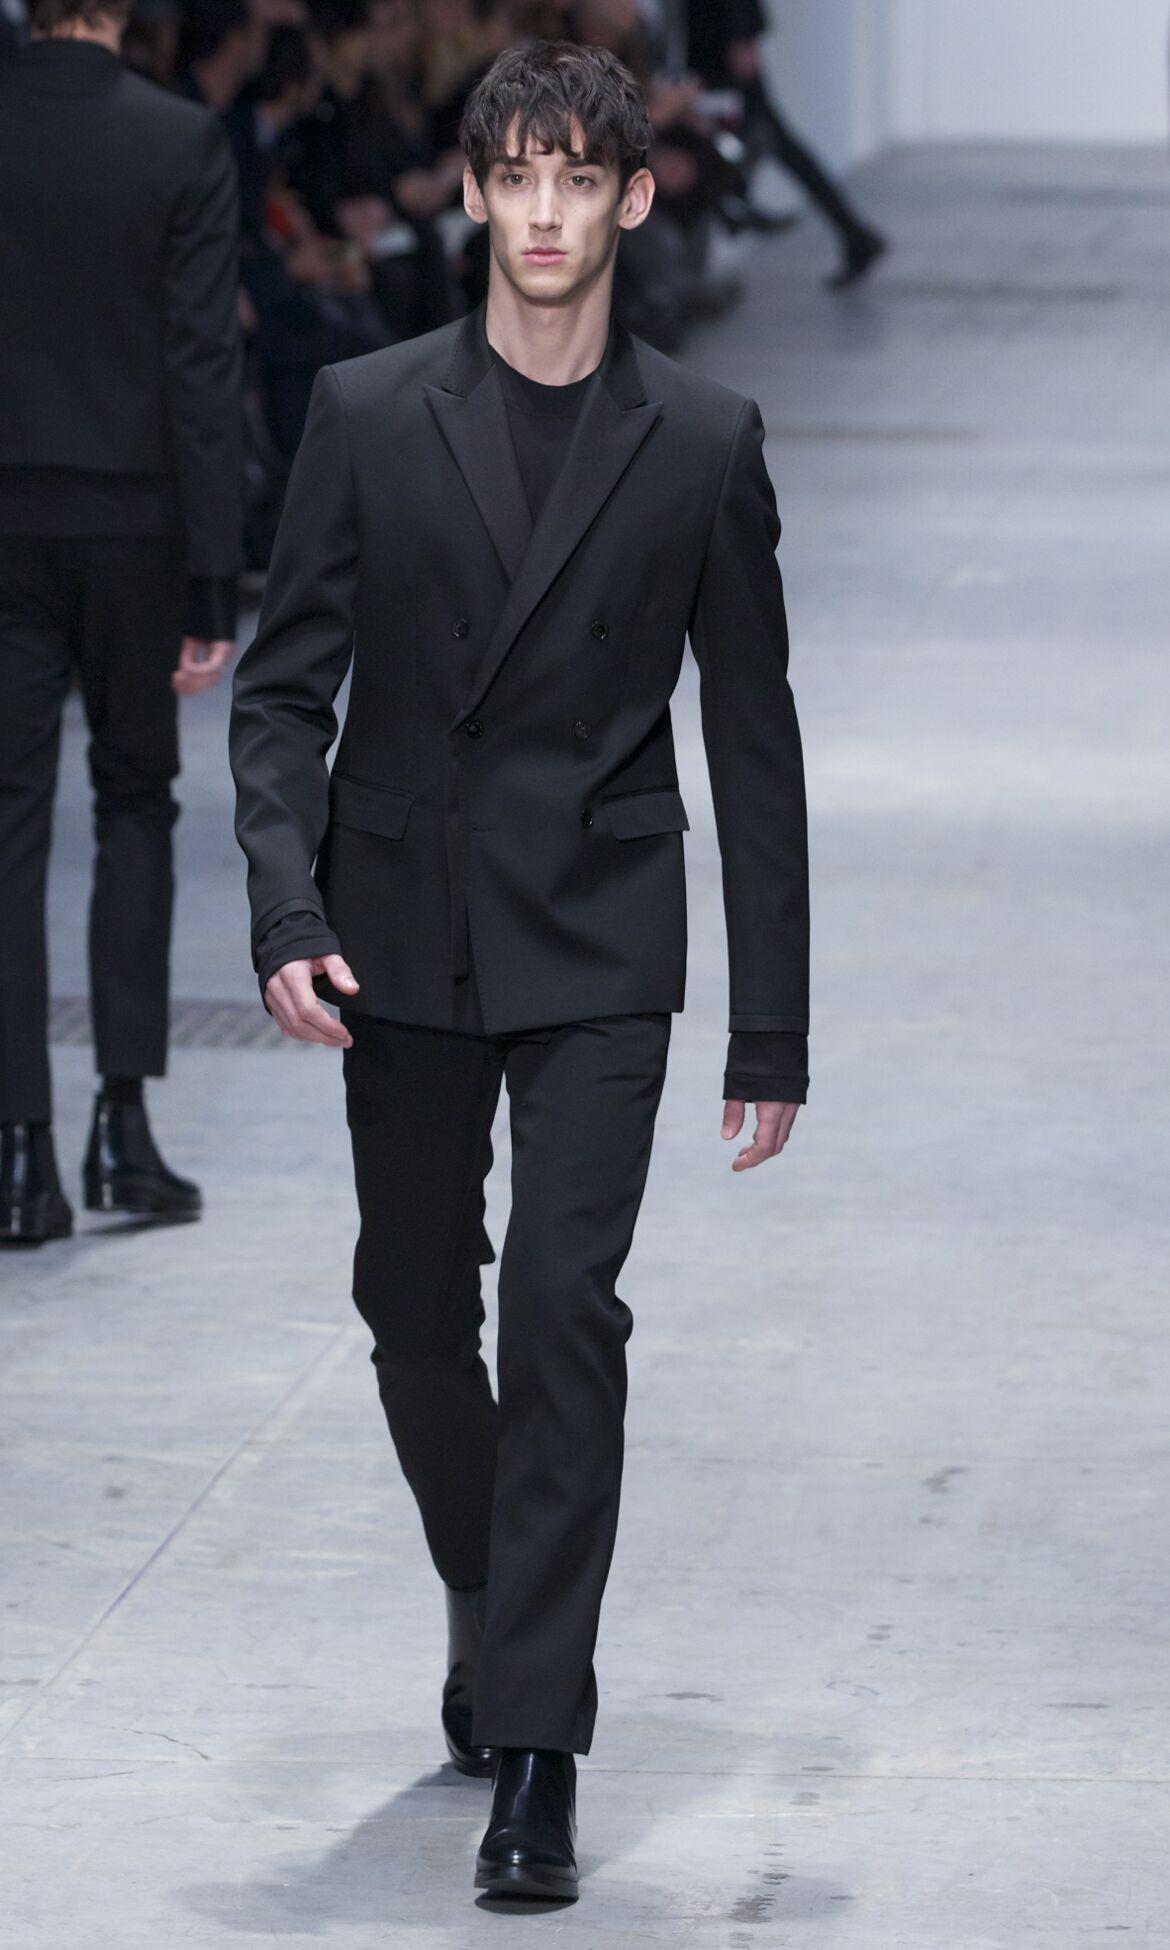 Menswear Fashion Show 2013 2014